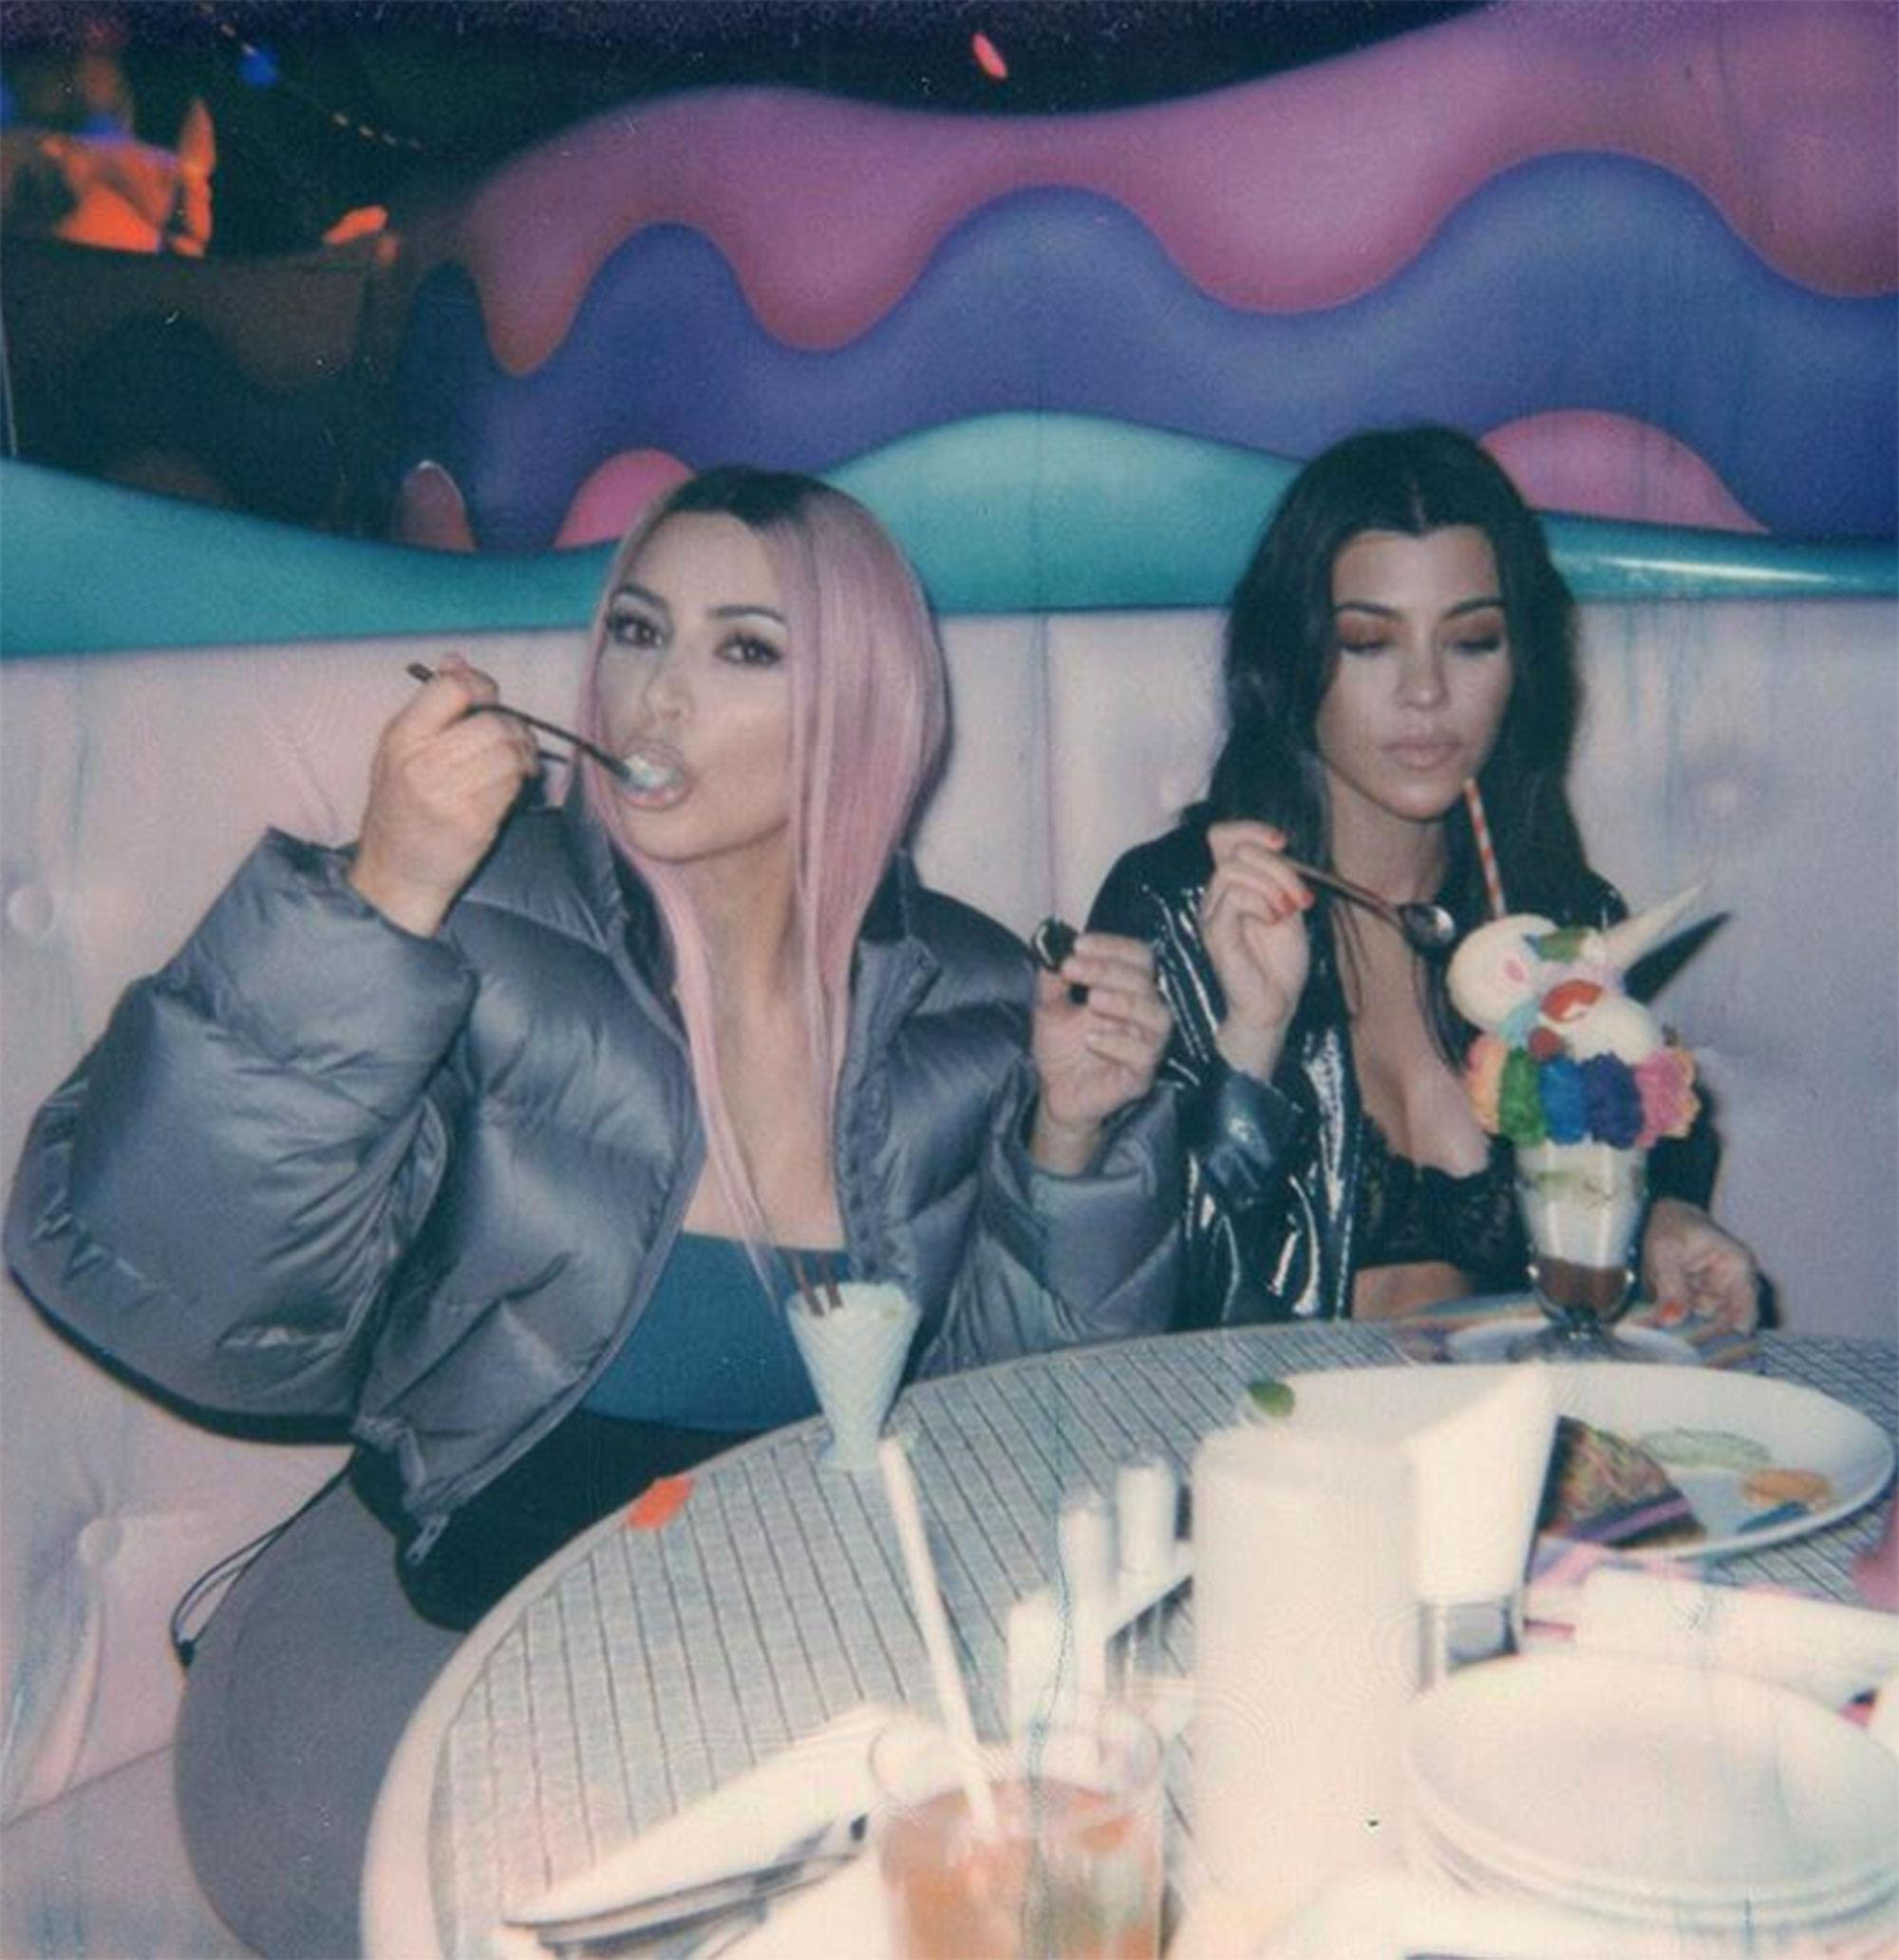 Wanna Be Kardashian Ͽ� Kourtney Ͽ� Midnight Cuddles Ͽ� Ͽ� I: Kim Kardashian 'Disgusted' With Kourtney And Khloé's Japan